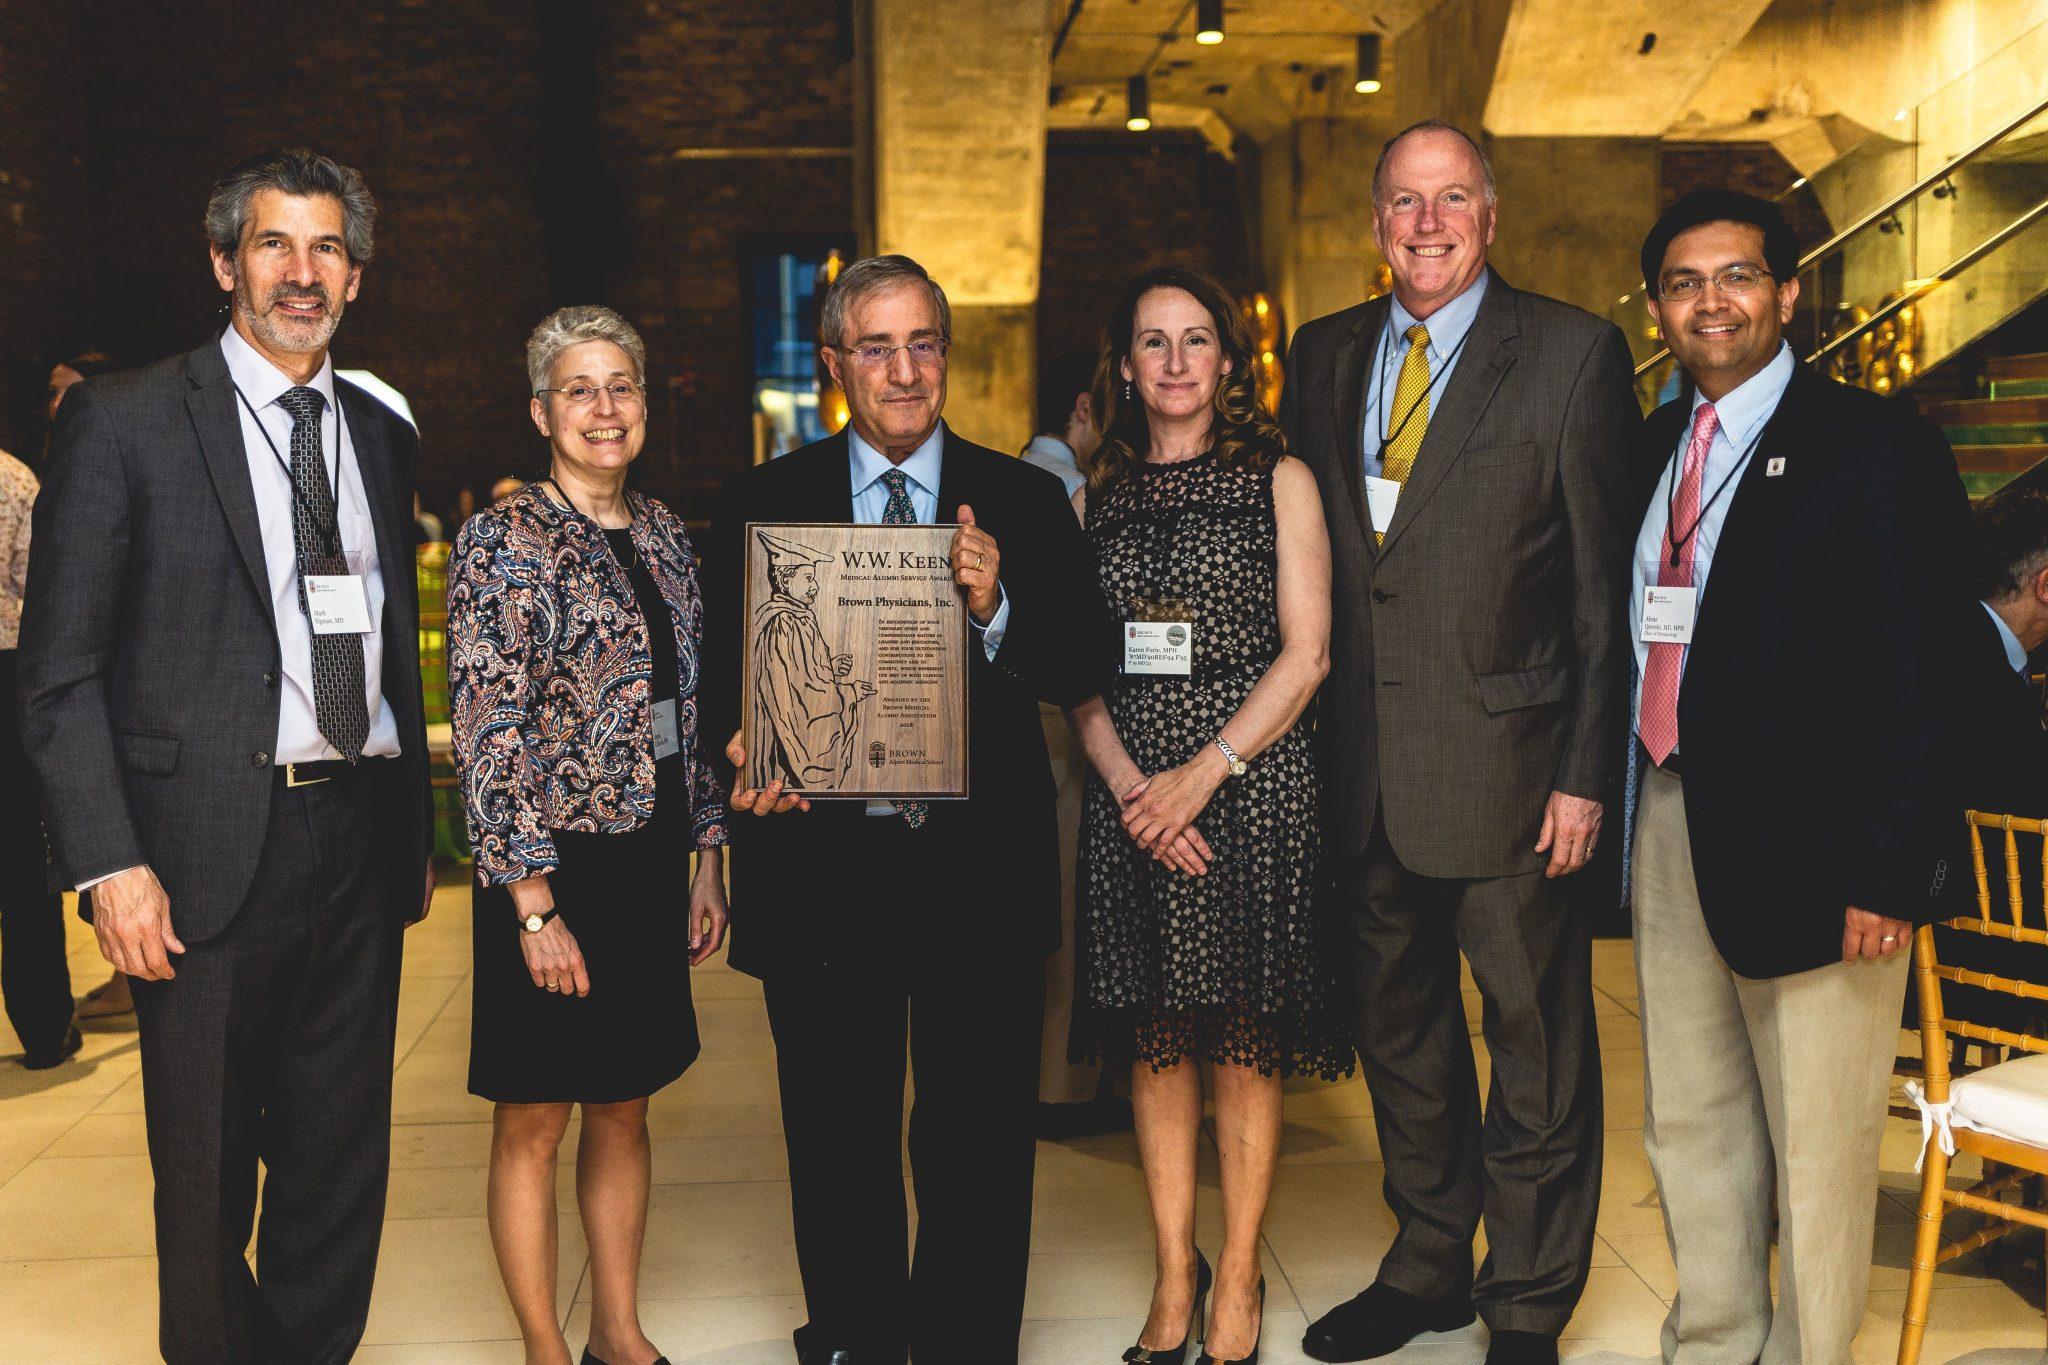 Brown Physicians senior leadership team wins WW Keen Award